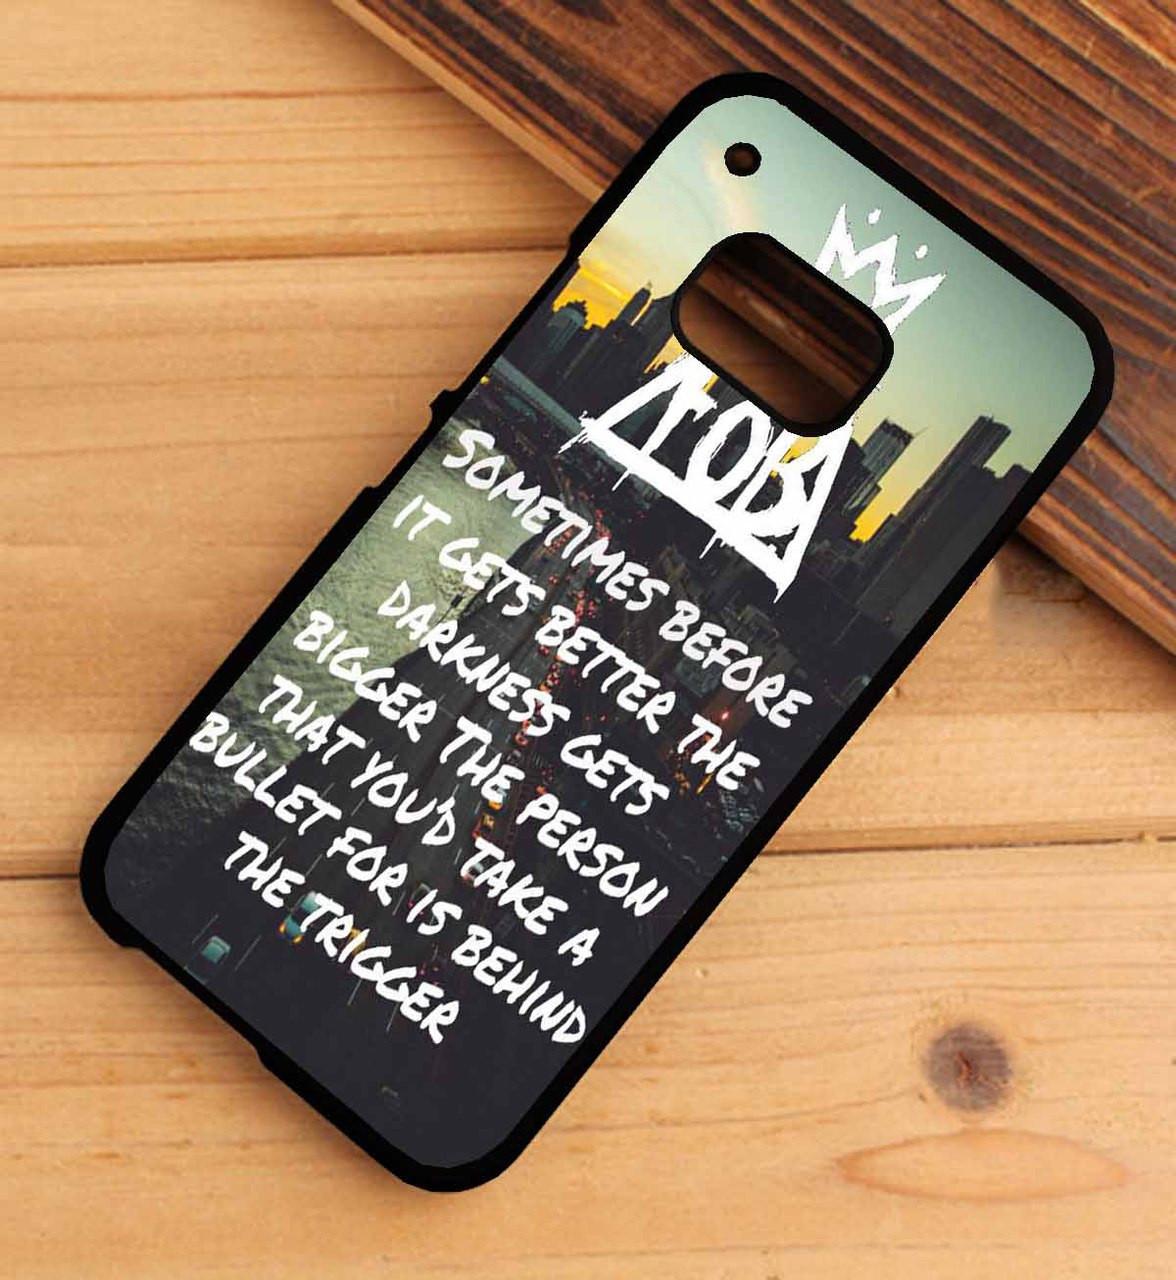 Miss Missing You - Fall Out Boy Lyrics Custom HTC One X M7 M8 M9 Case